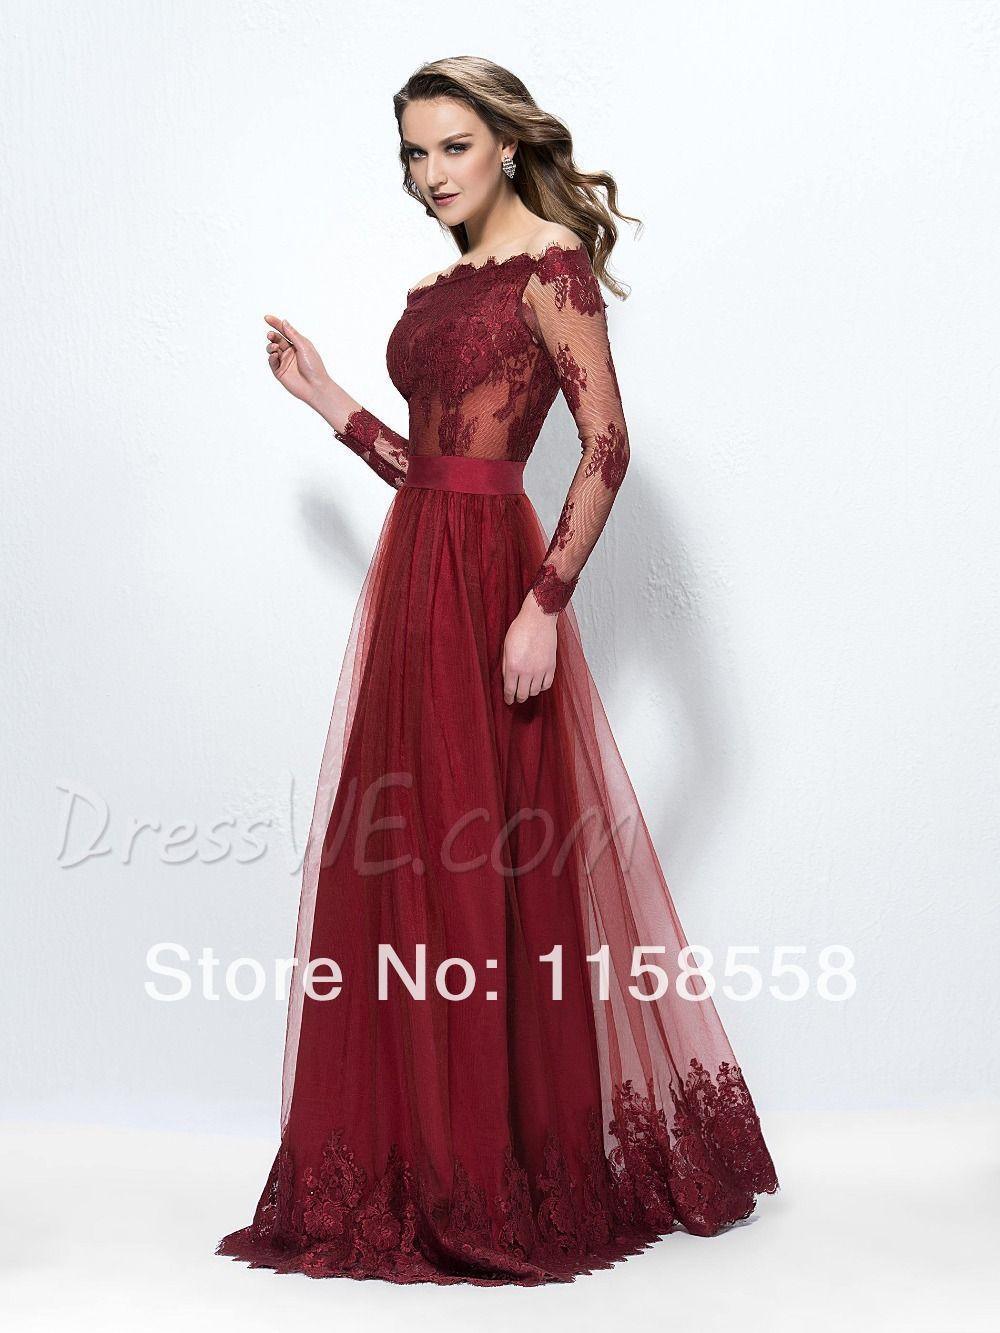 Evening Dresses Trends u images free download Cocktail